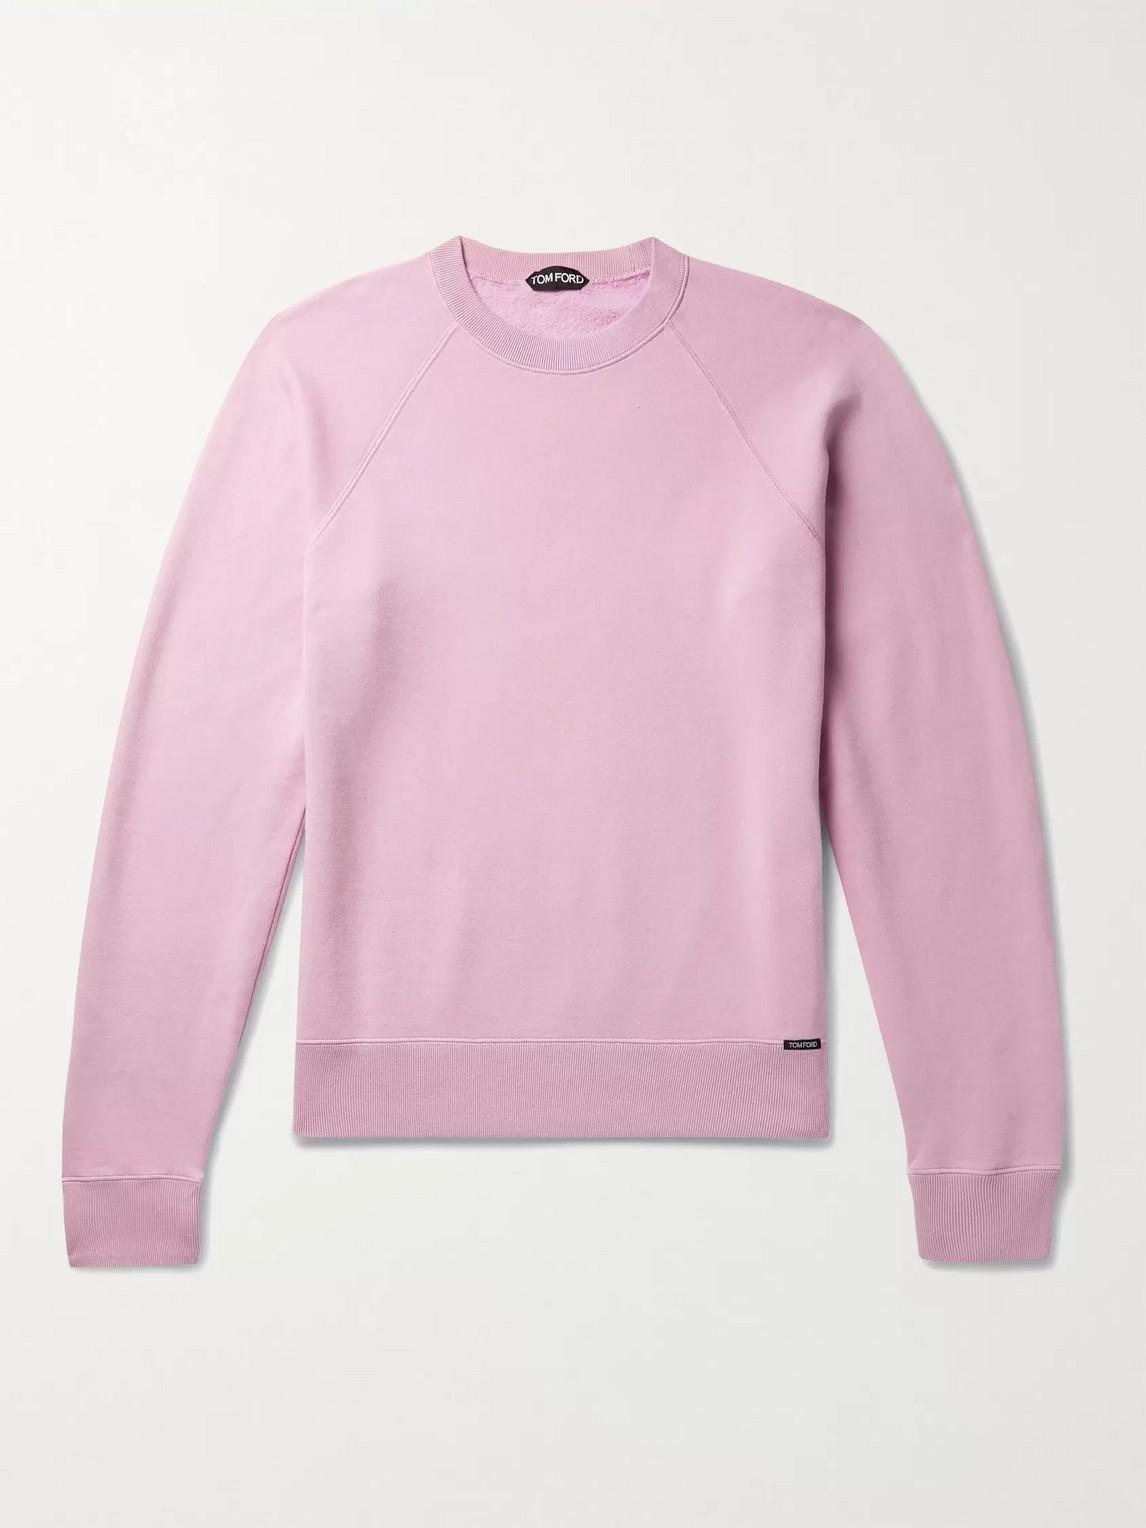 Tom Ford Fleece-back Cotton-jersey Sweatshirt In Pink